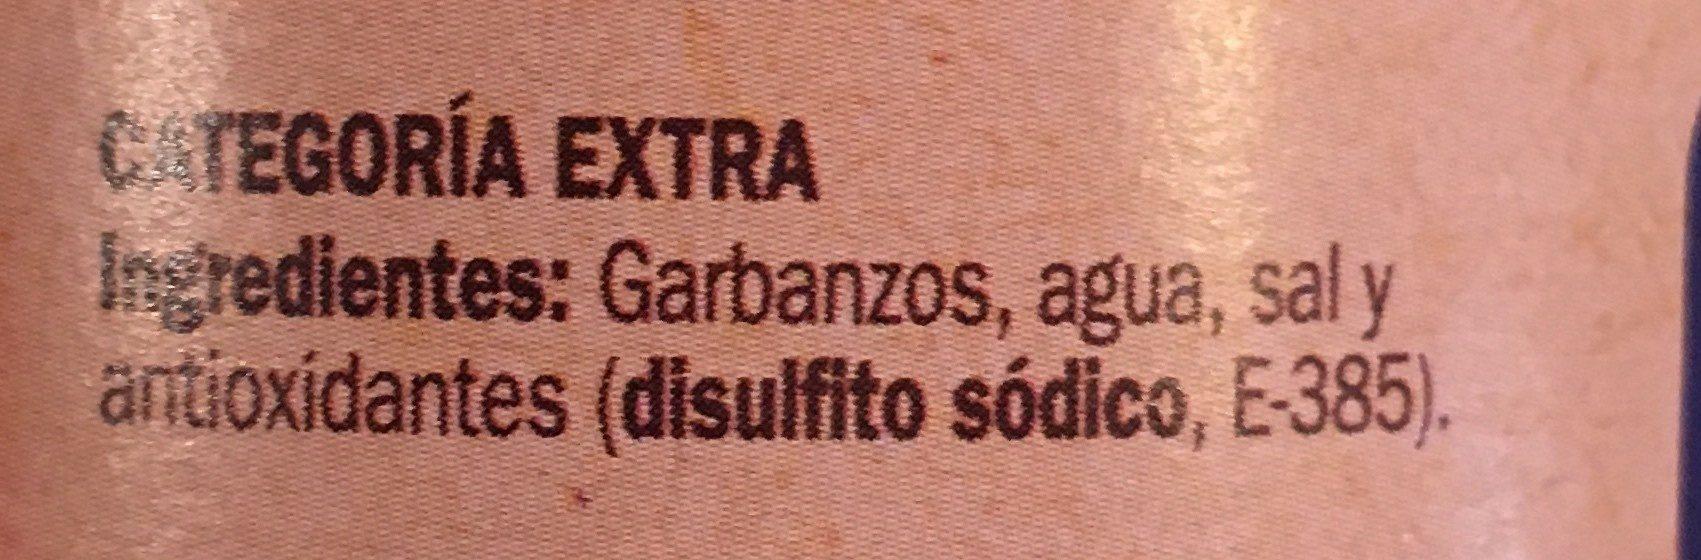 Garbanzo - Ingrédients